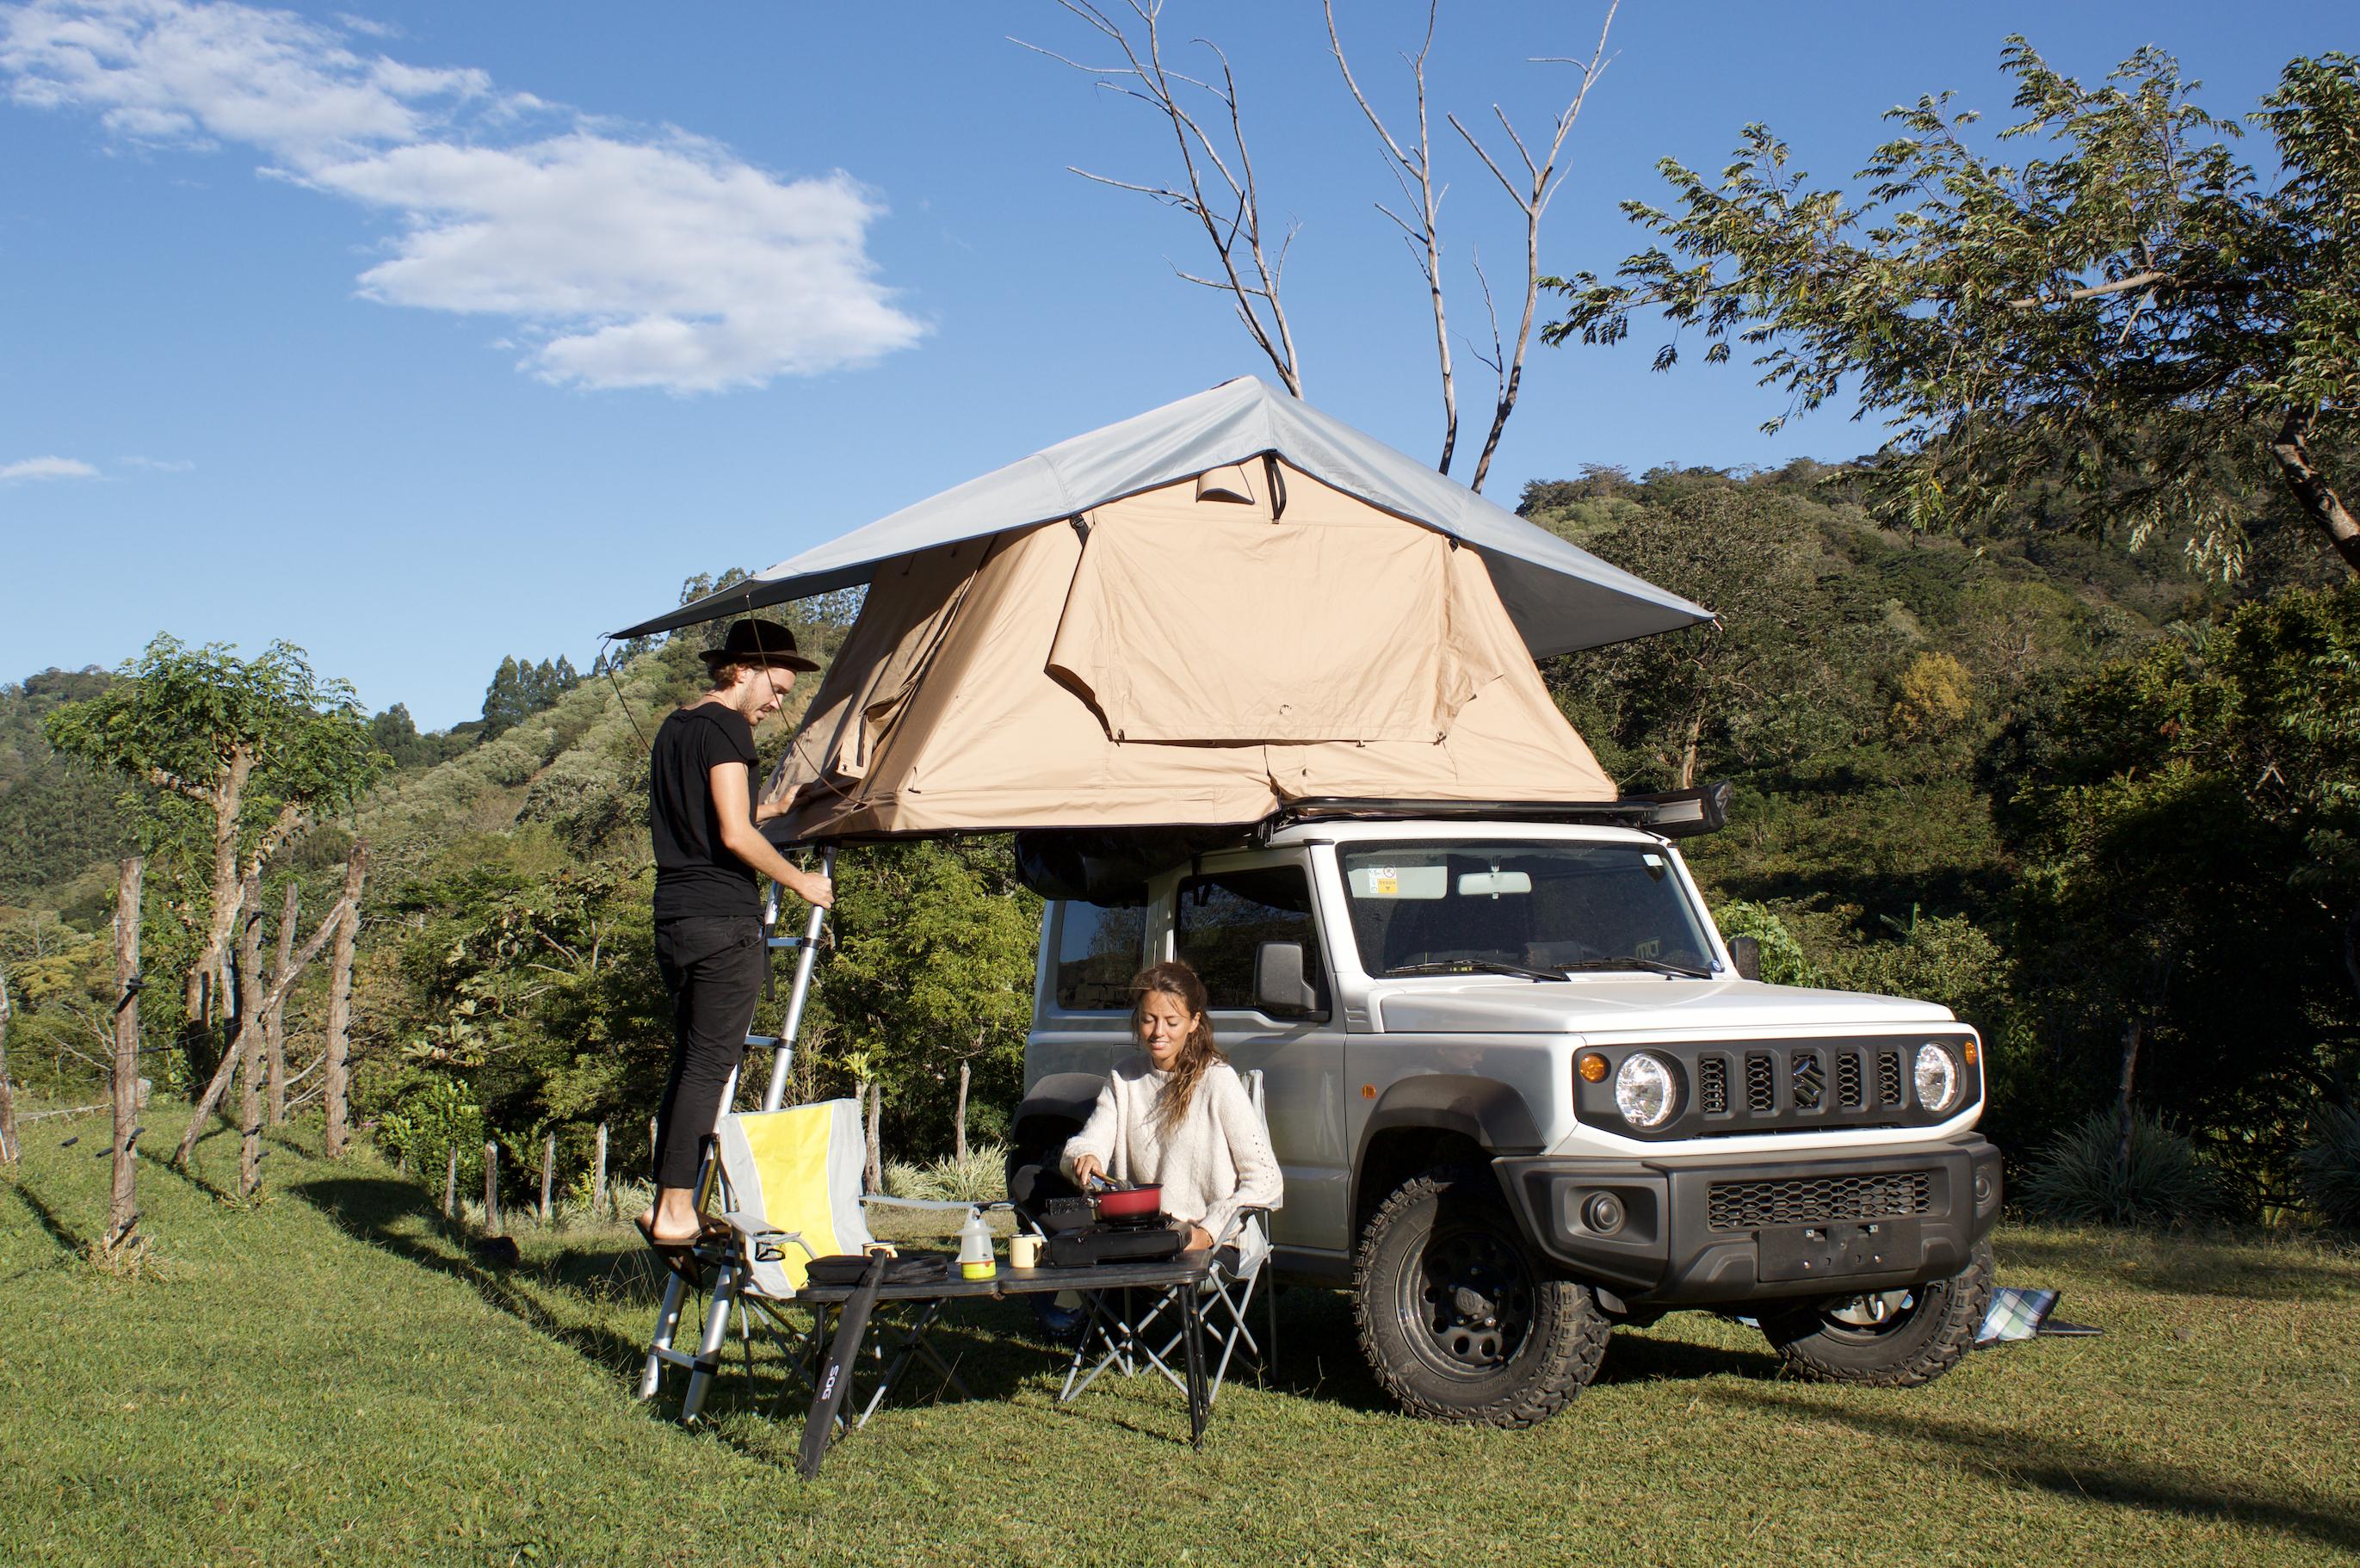 New Suzuki Jimny Costa Rica